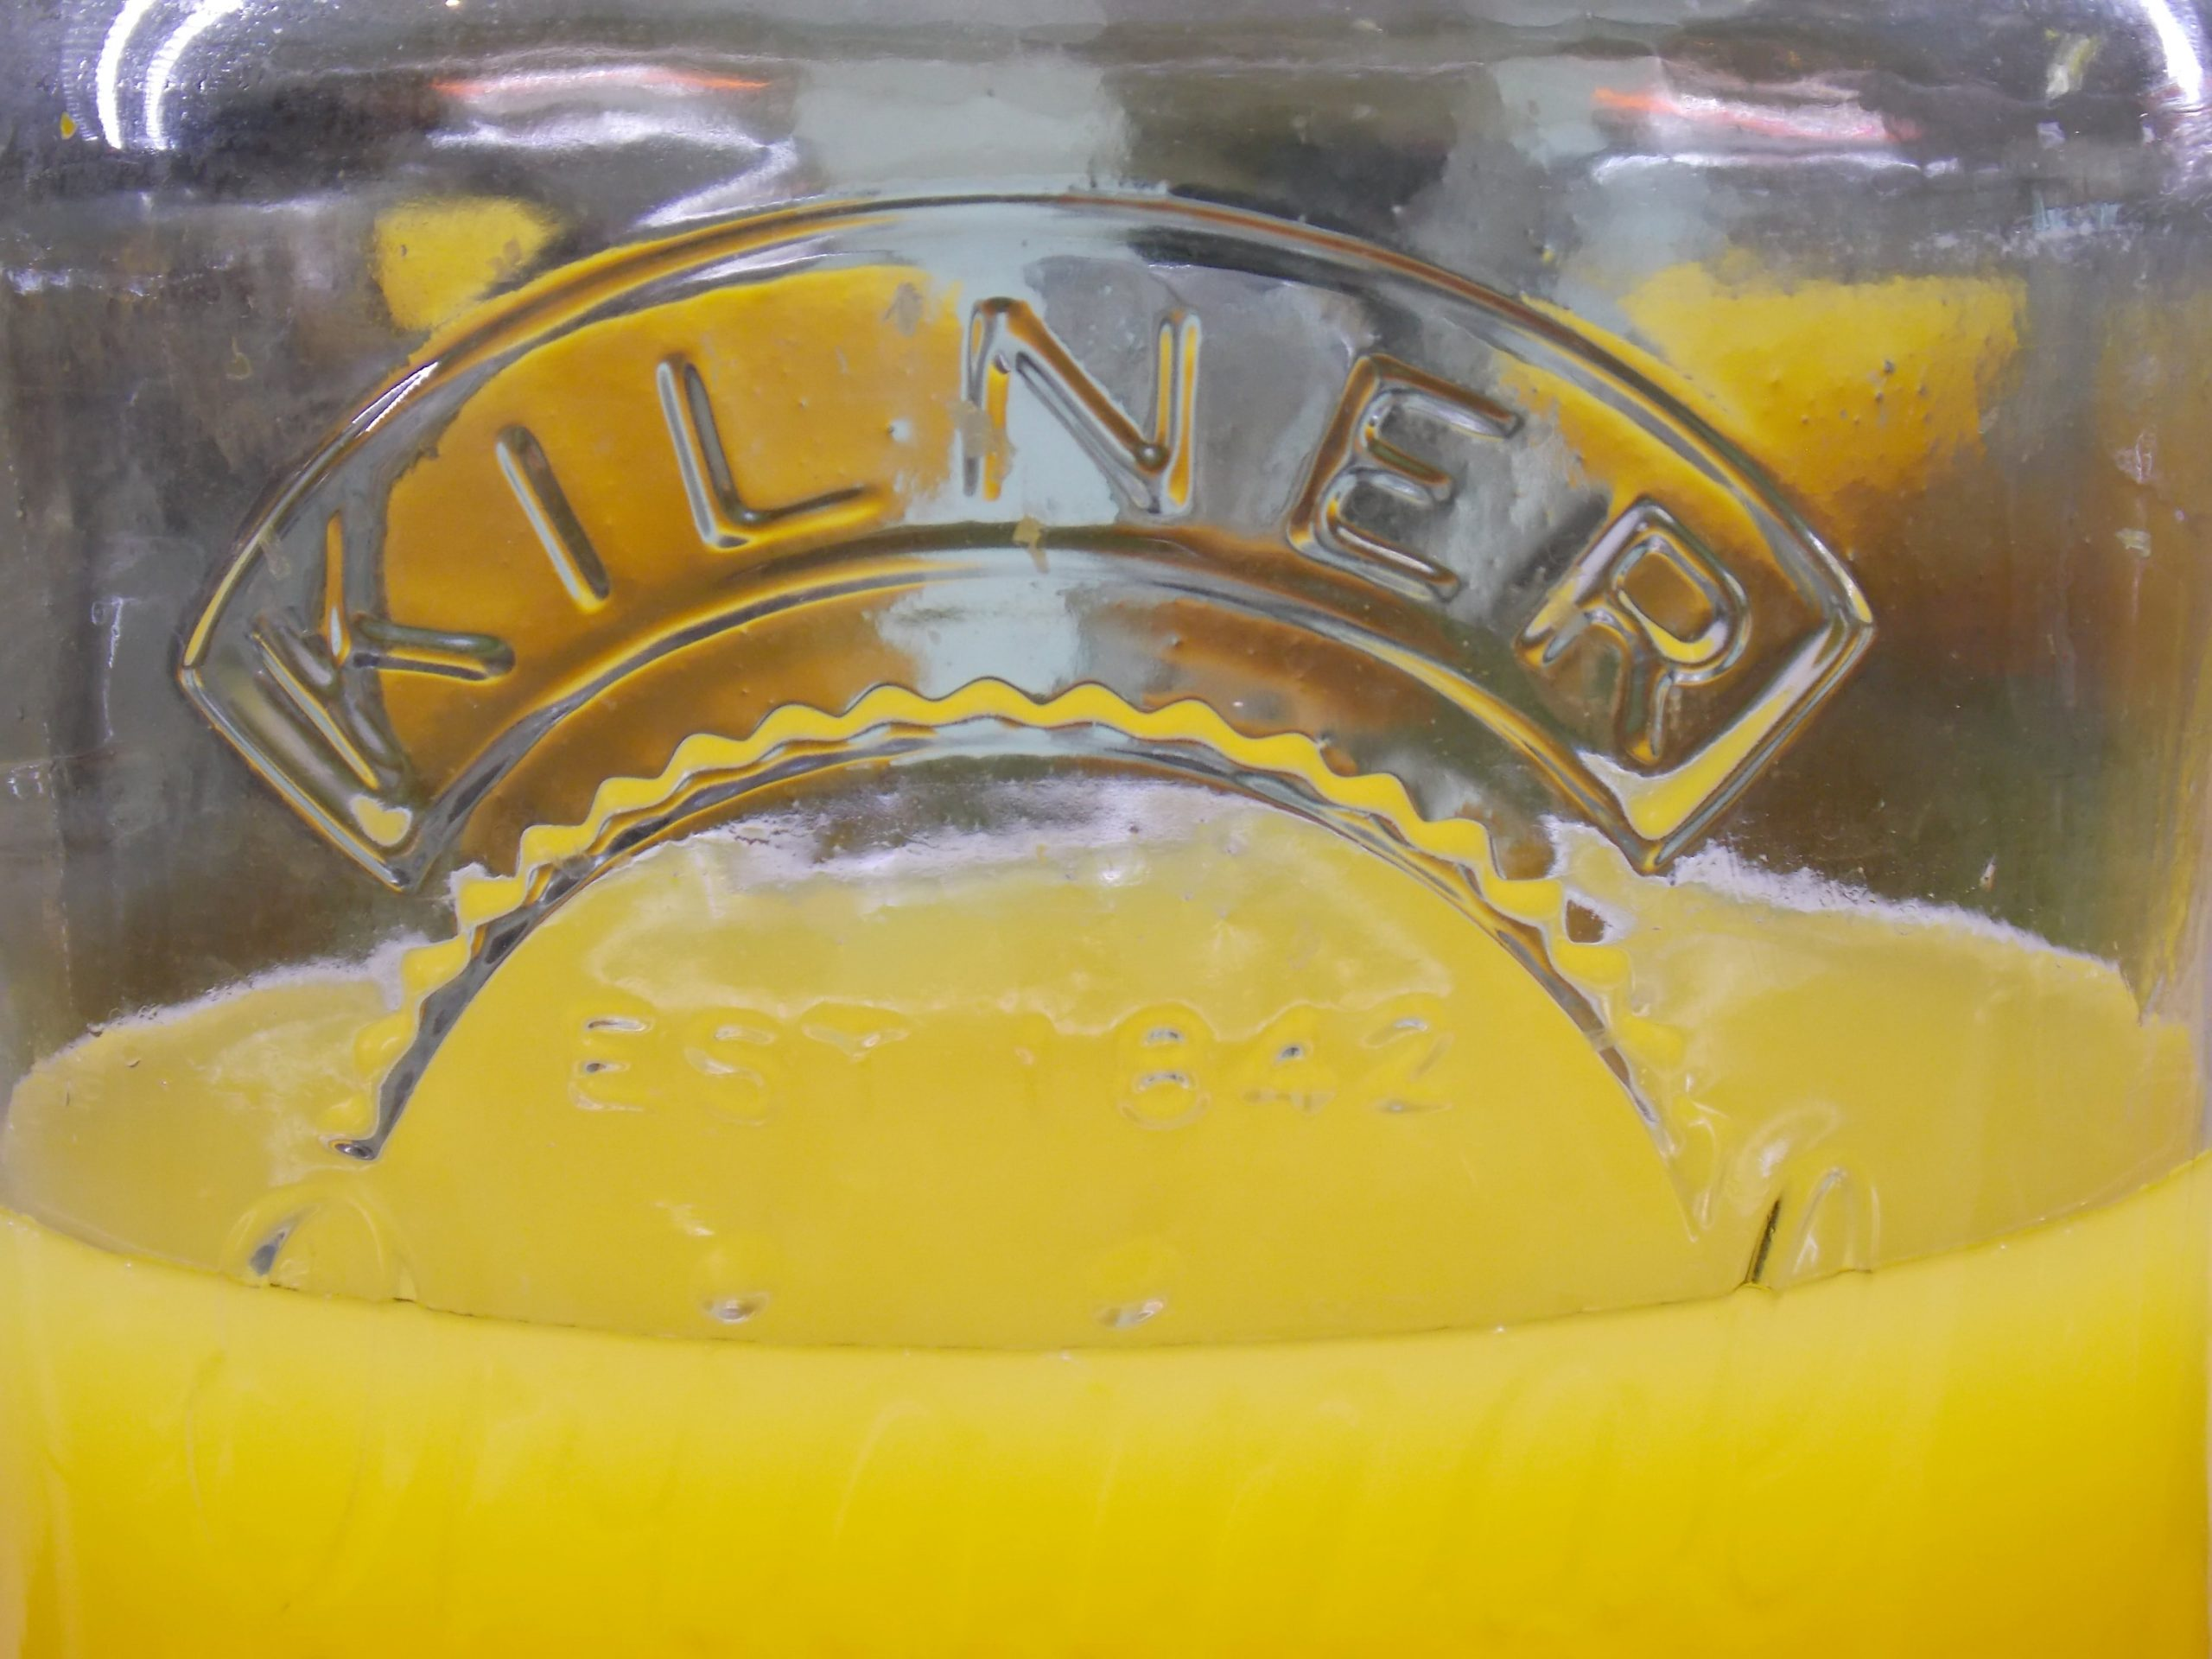 Deayunar zumo de naranja en Ibiza